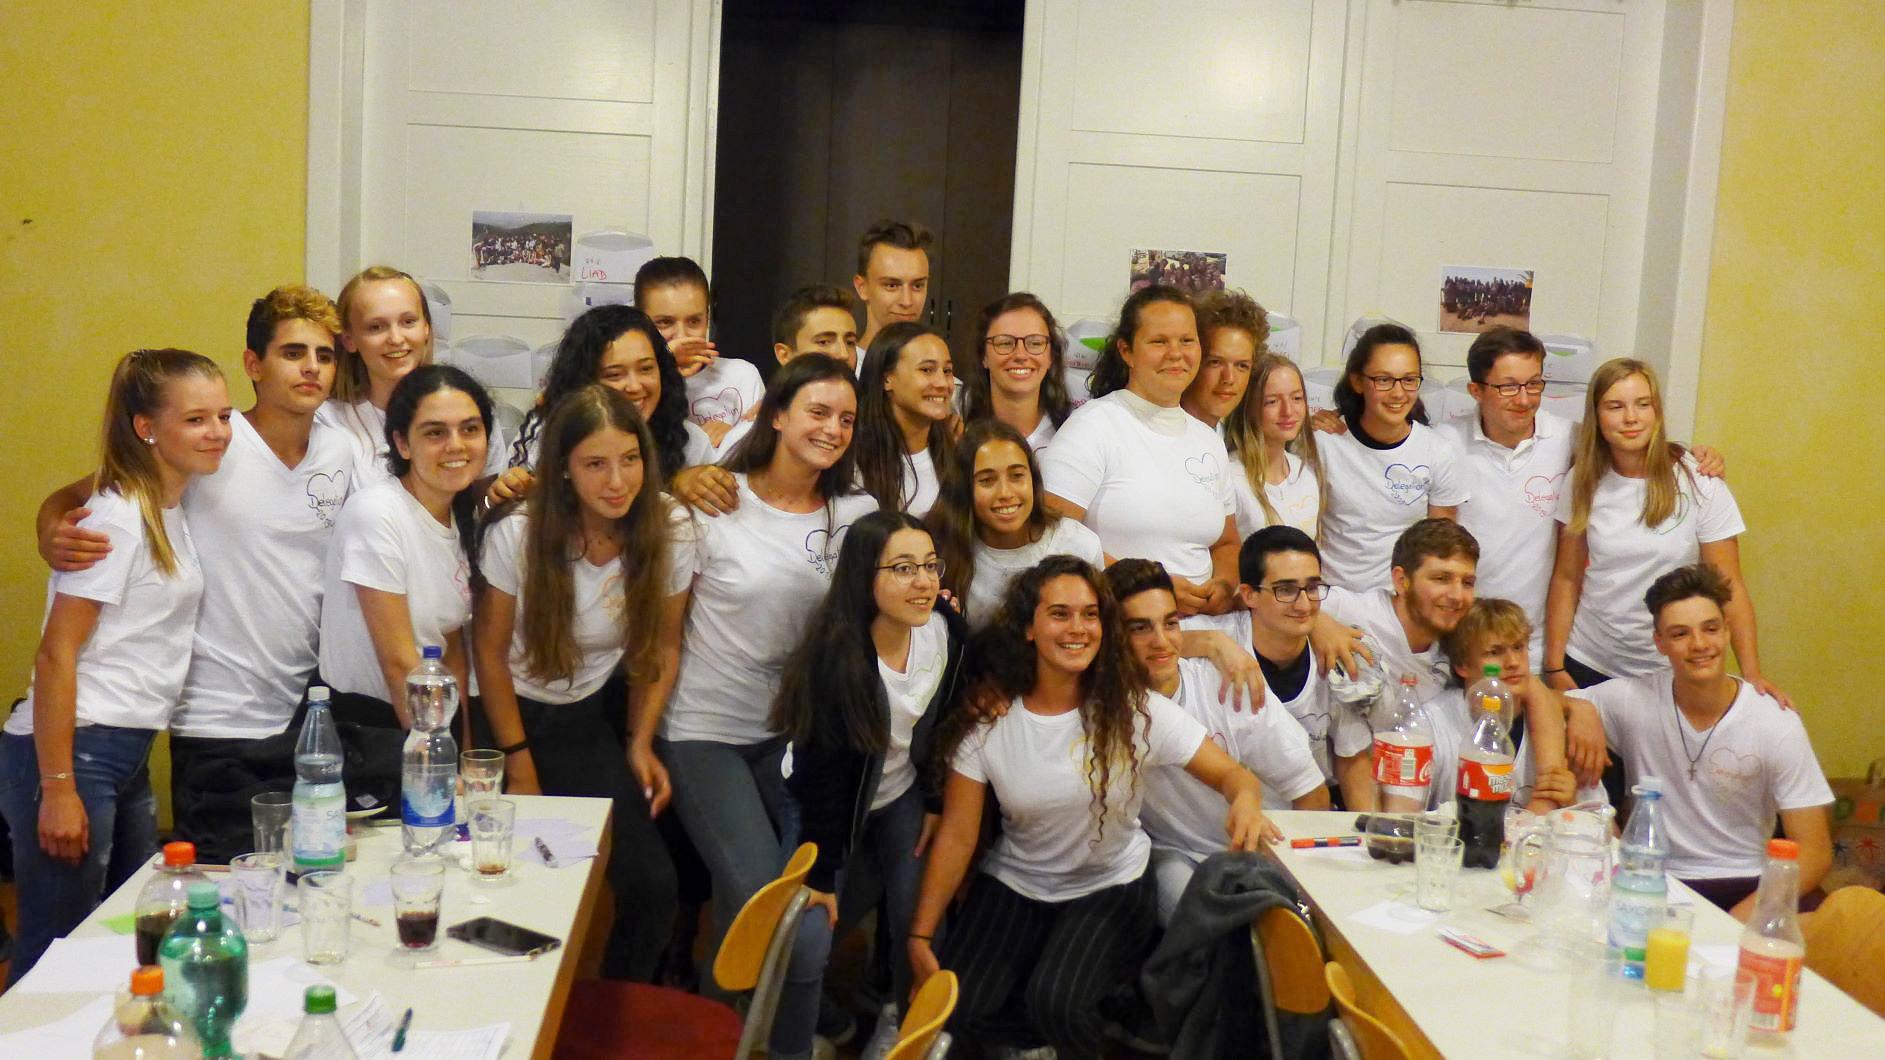 Abschiedsfoto der ganzen Gruppe - Jugendaustausch Le Chaim Israel-Belzig